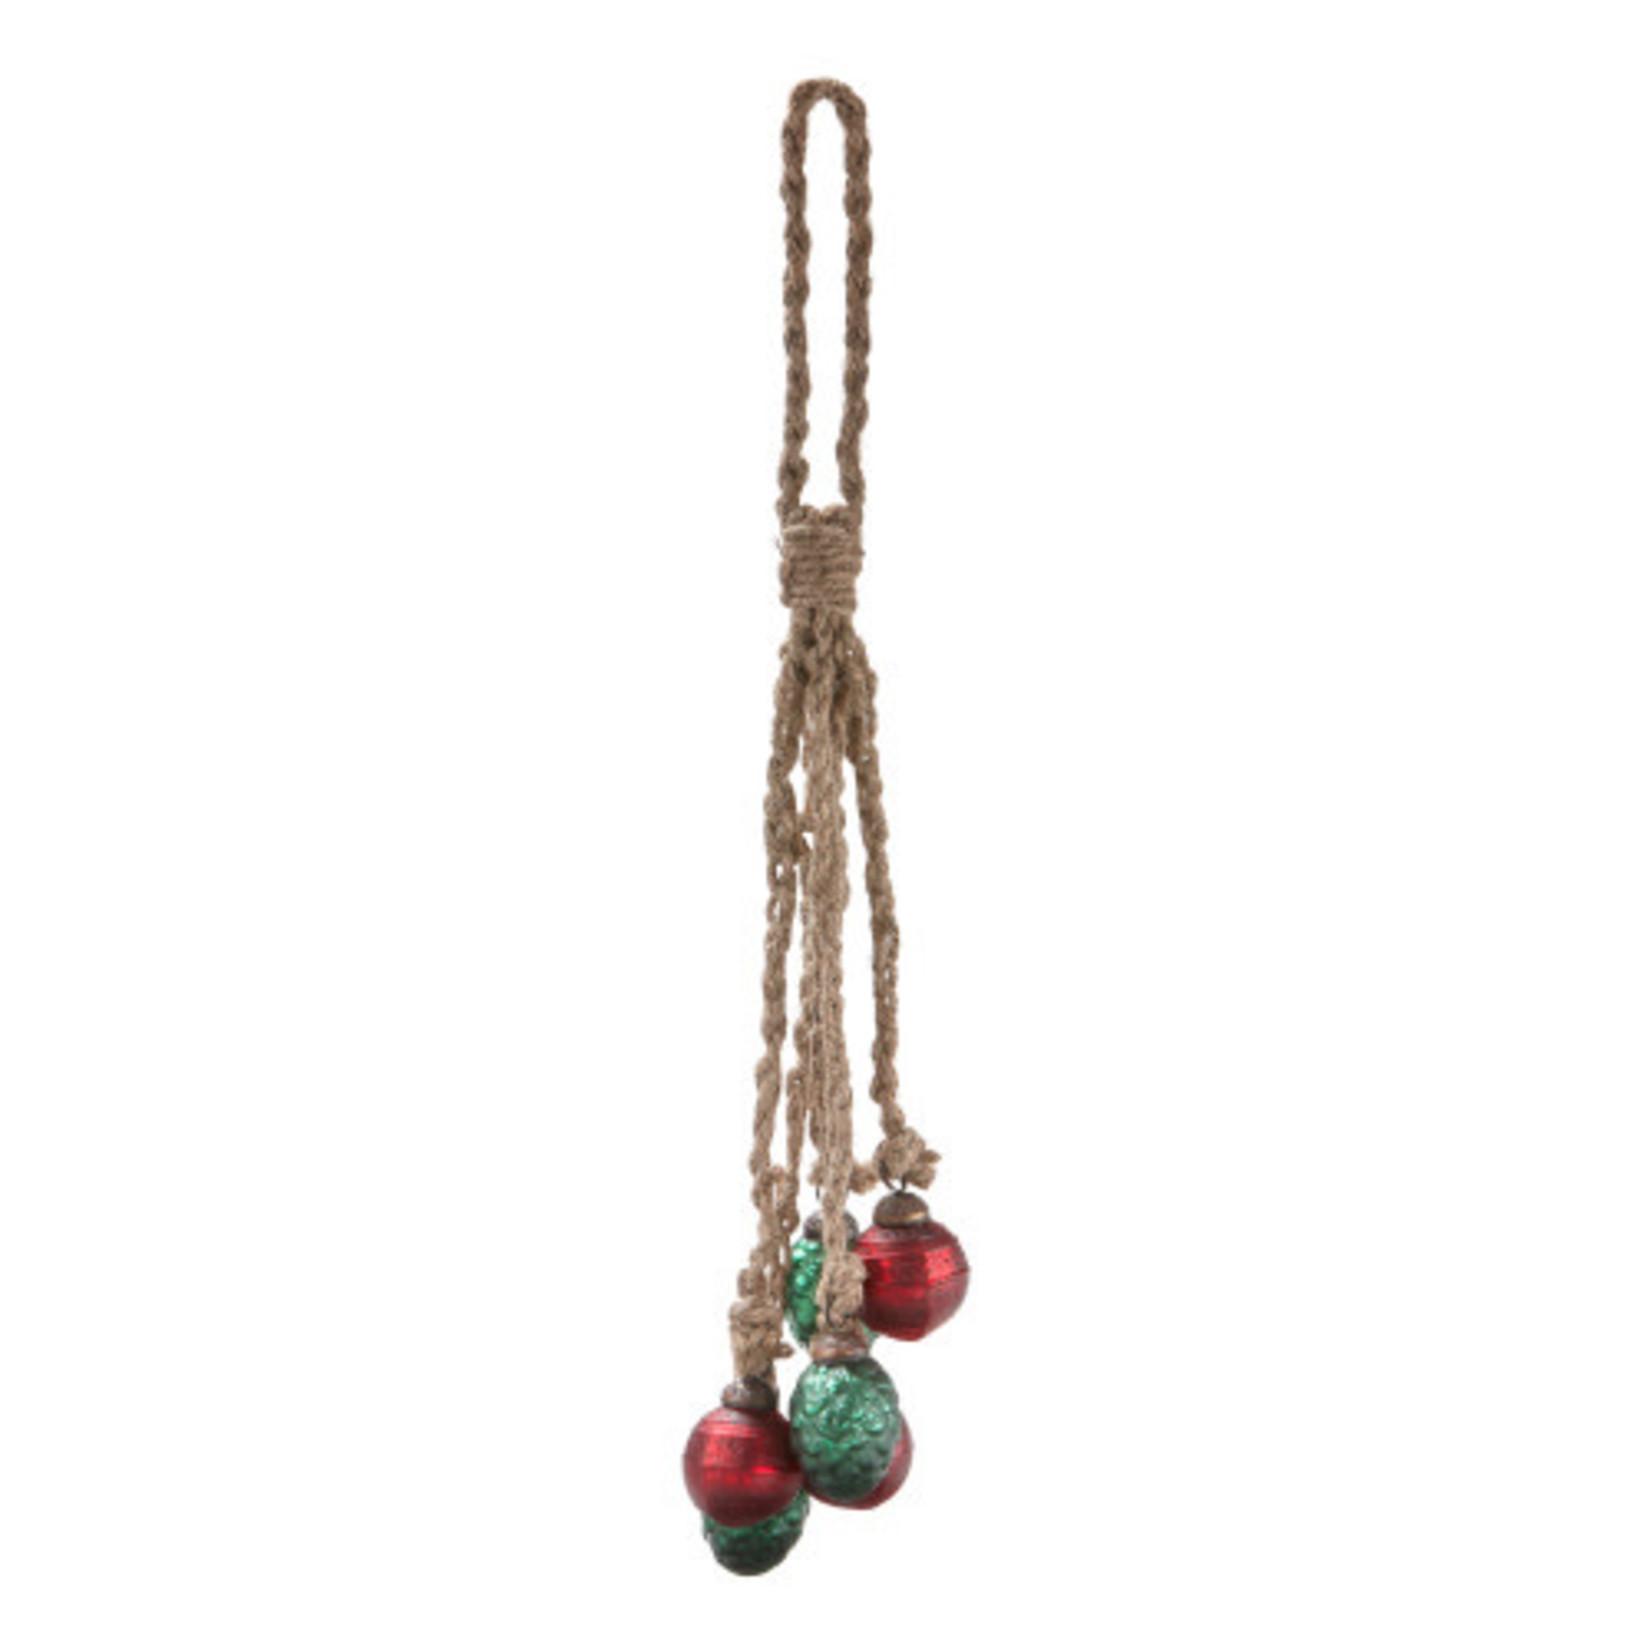 Festive Heirloom Ornament Cluster